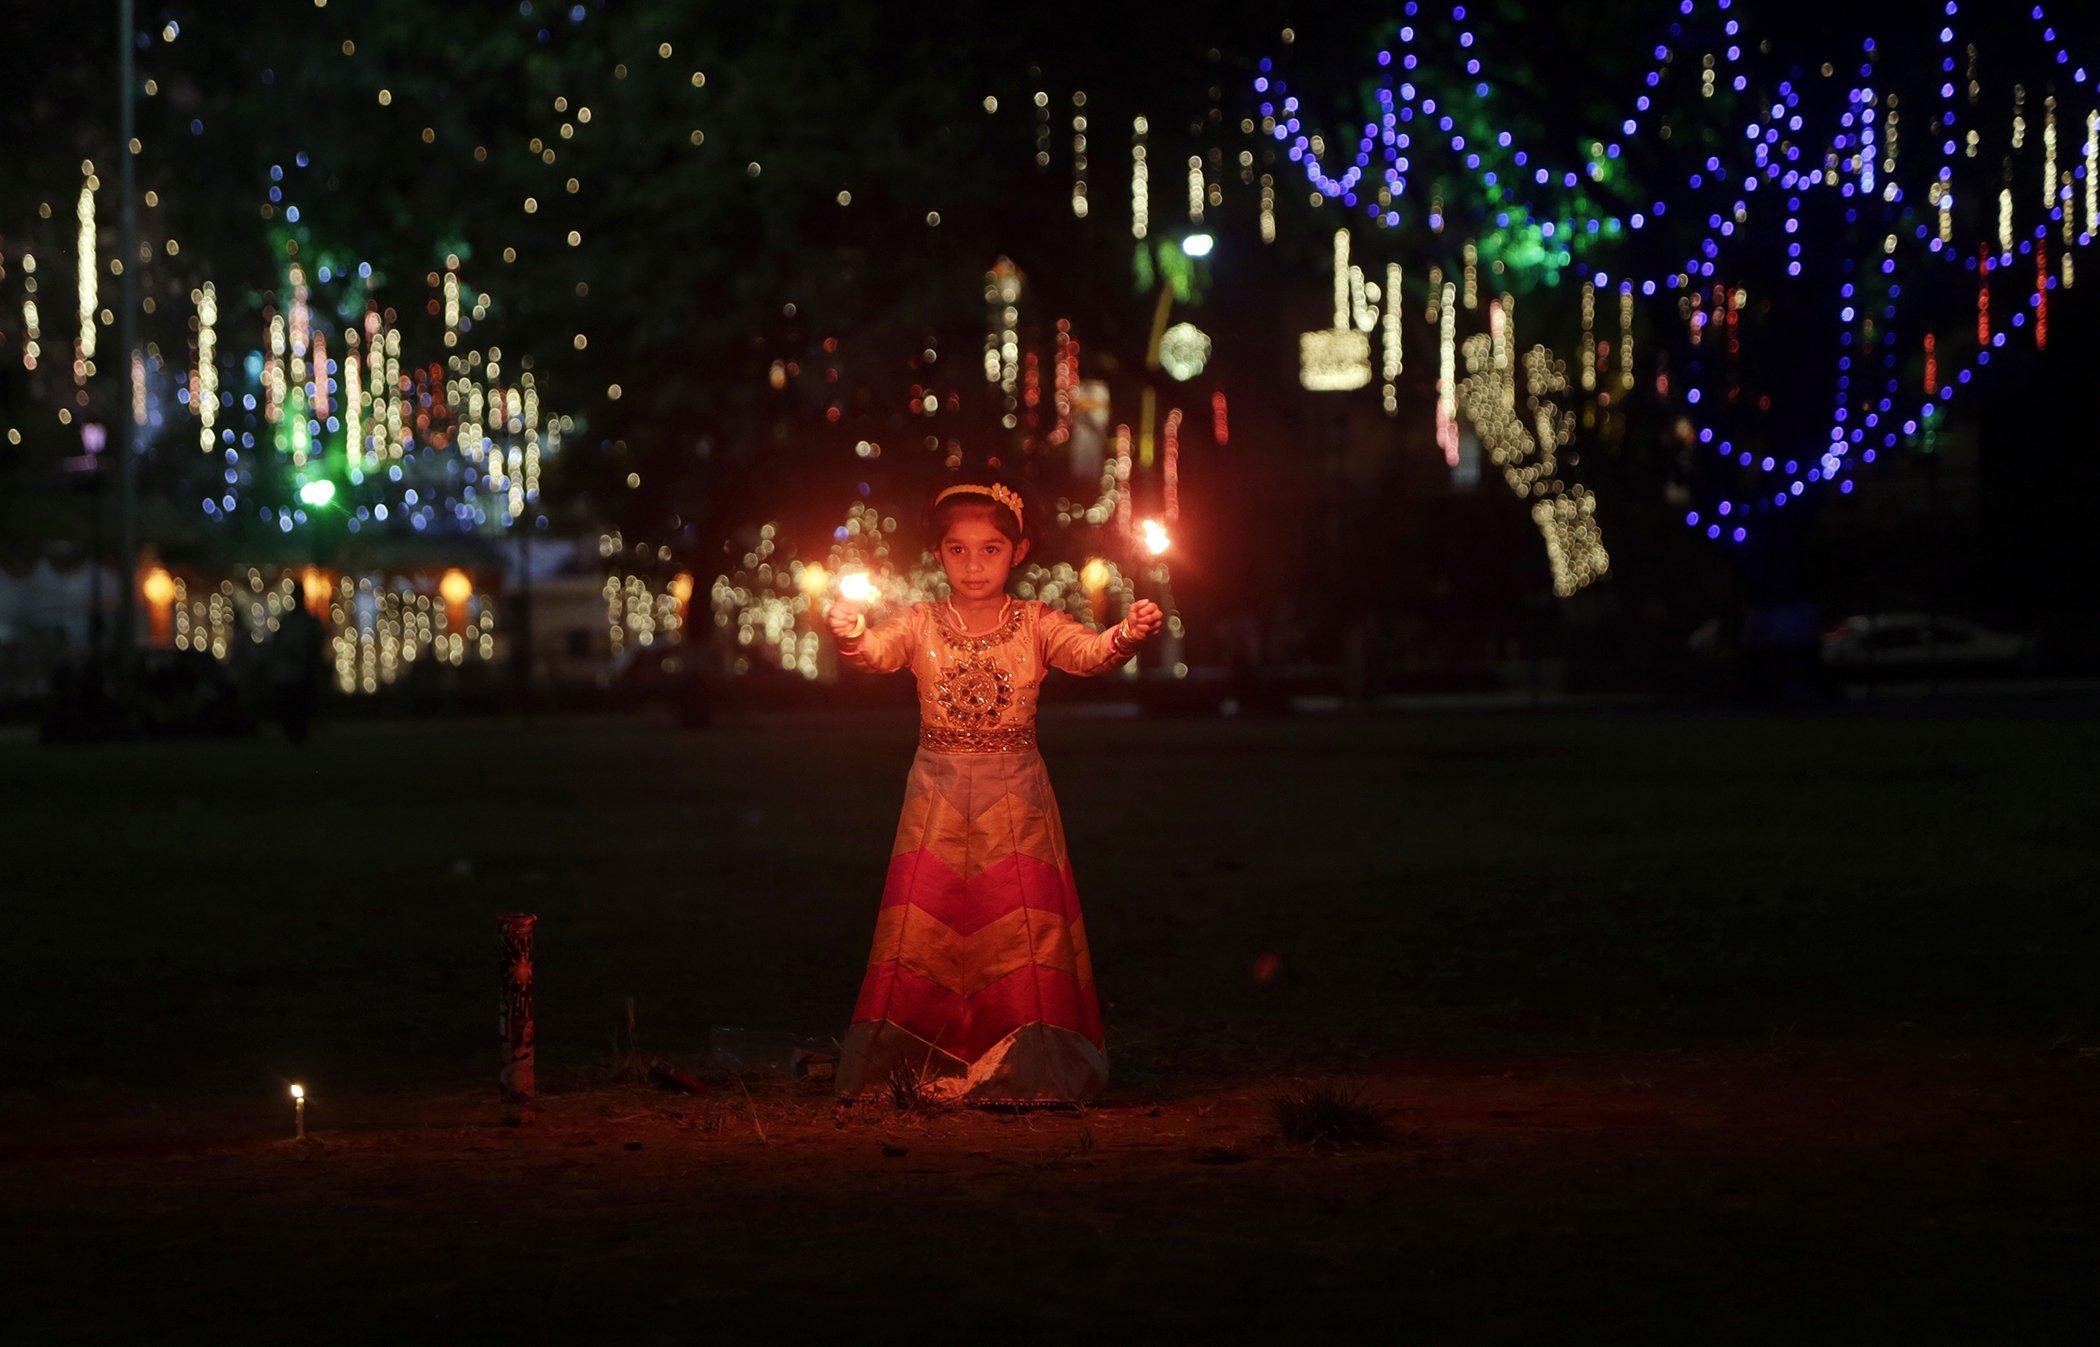 Diwali-India-Festival-2018-2.jpg